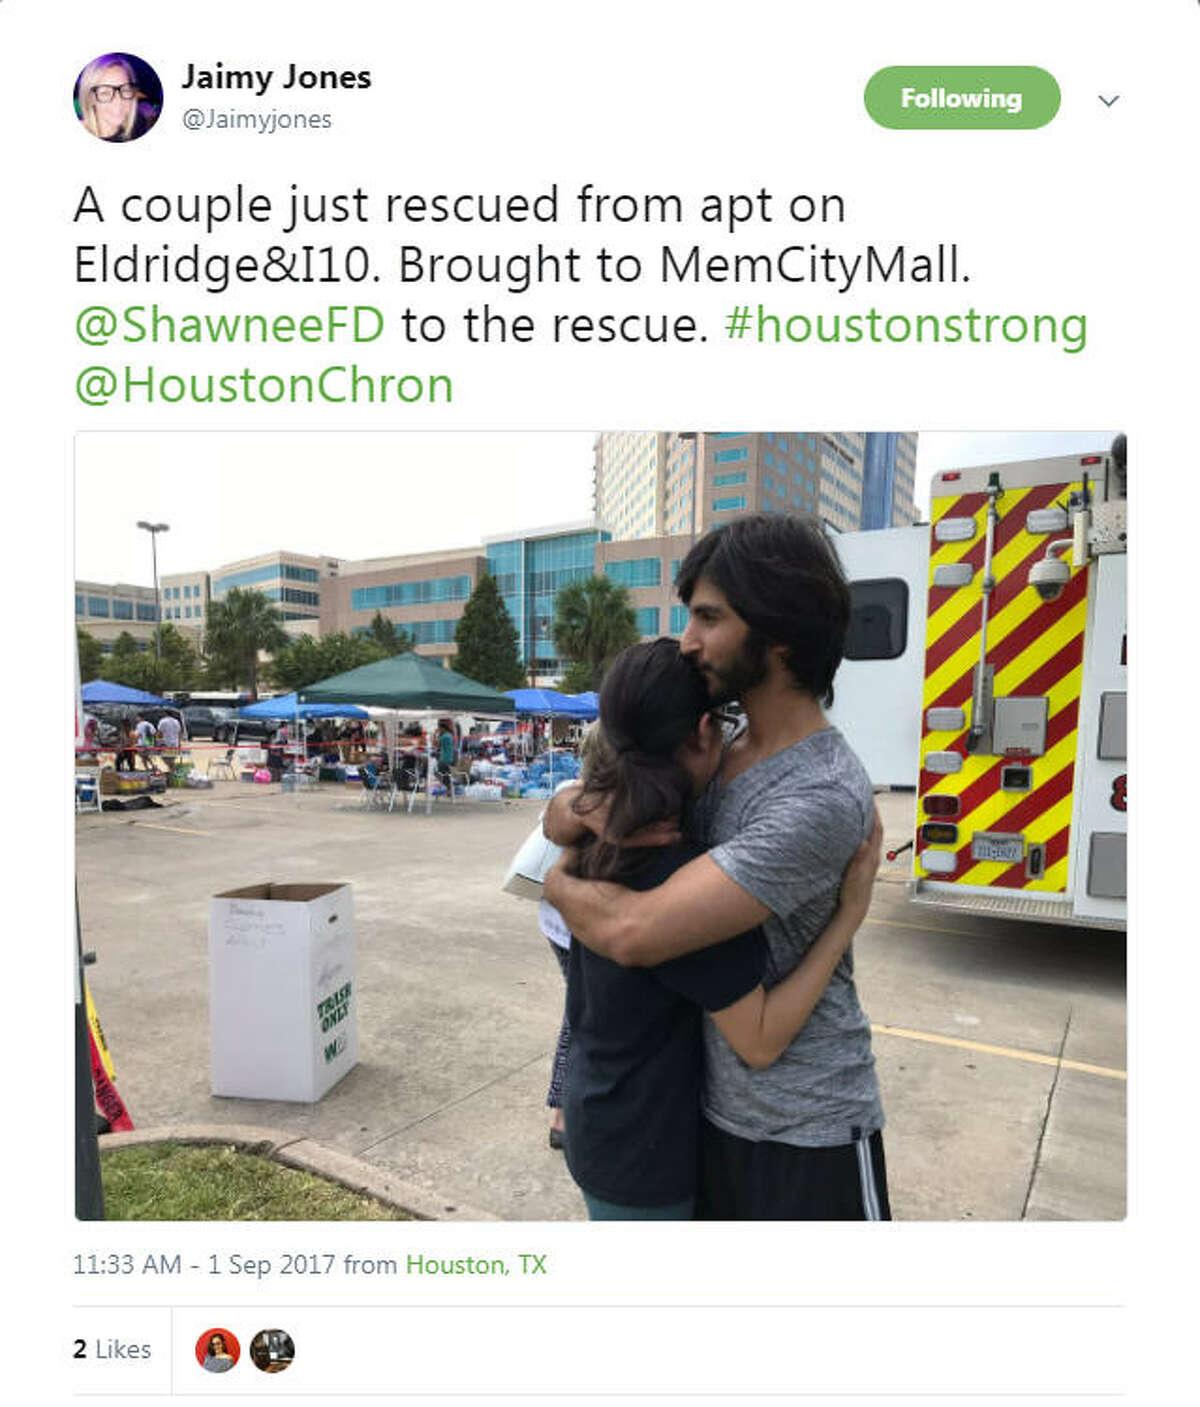 The unshakable Houston spirit reflected on social media as people began posting using #HoustonStrong via social media